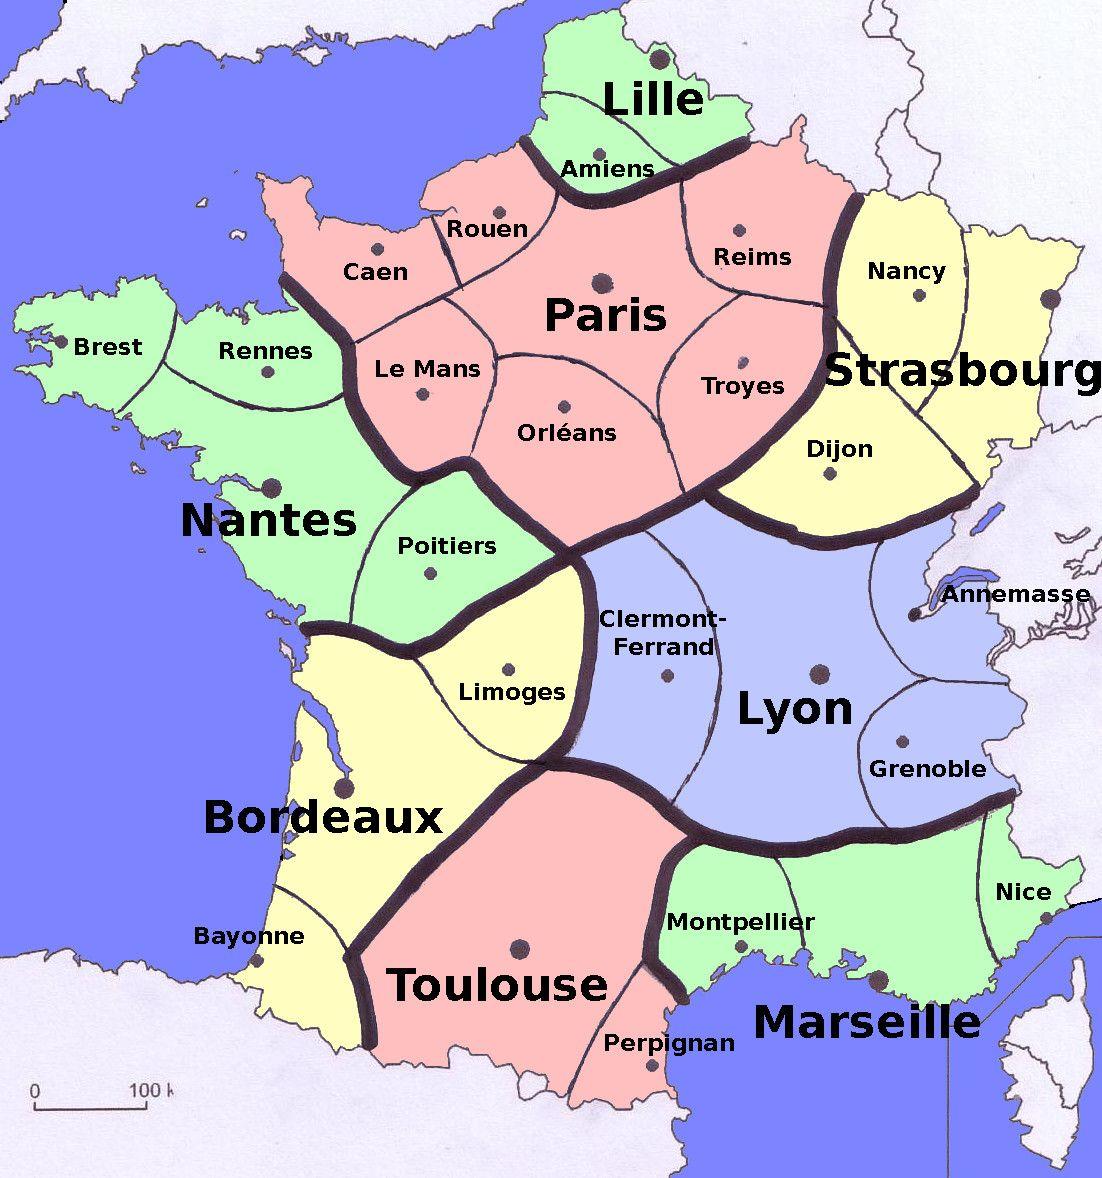 Carte de France découpée en 8 zones Habita, Uñas francesas